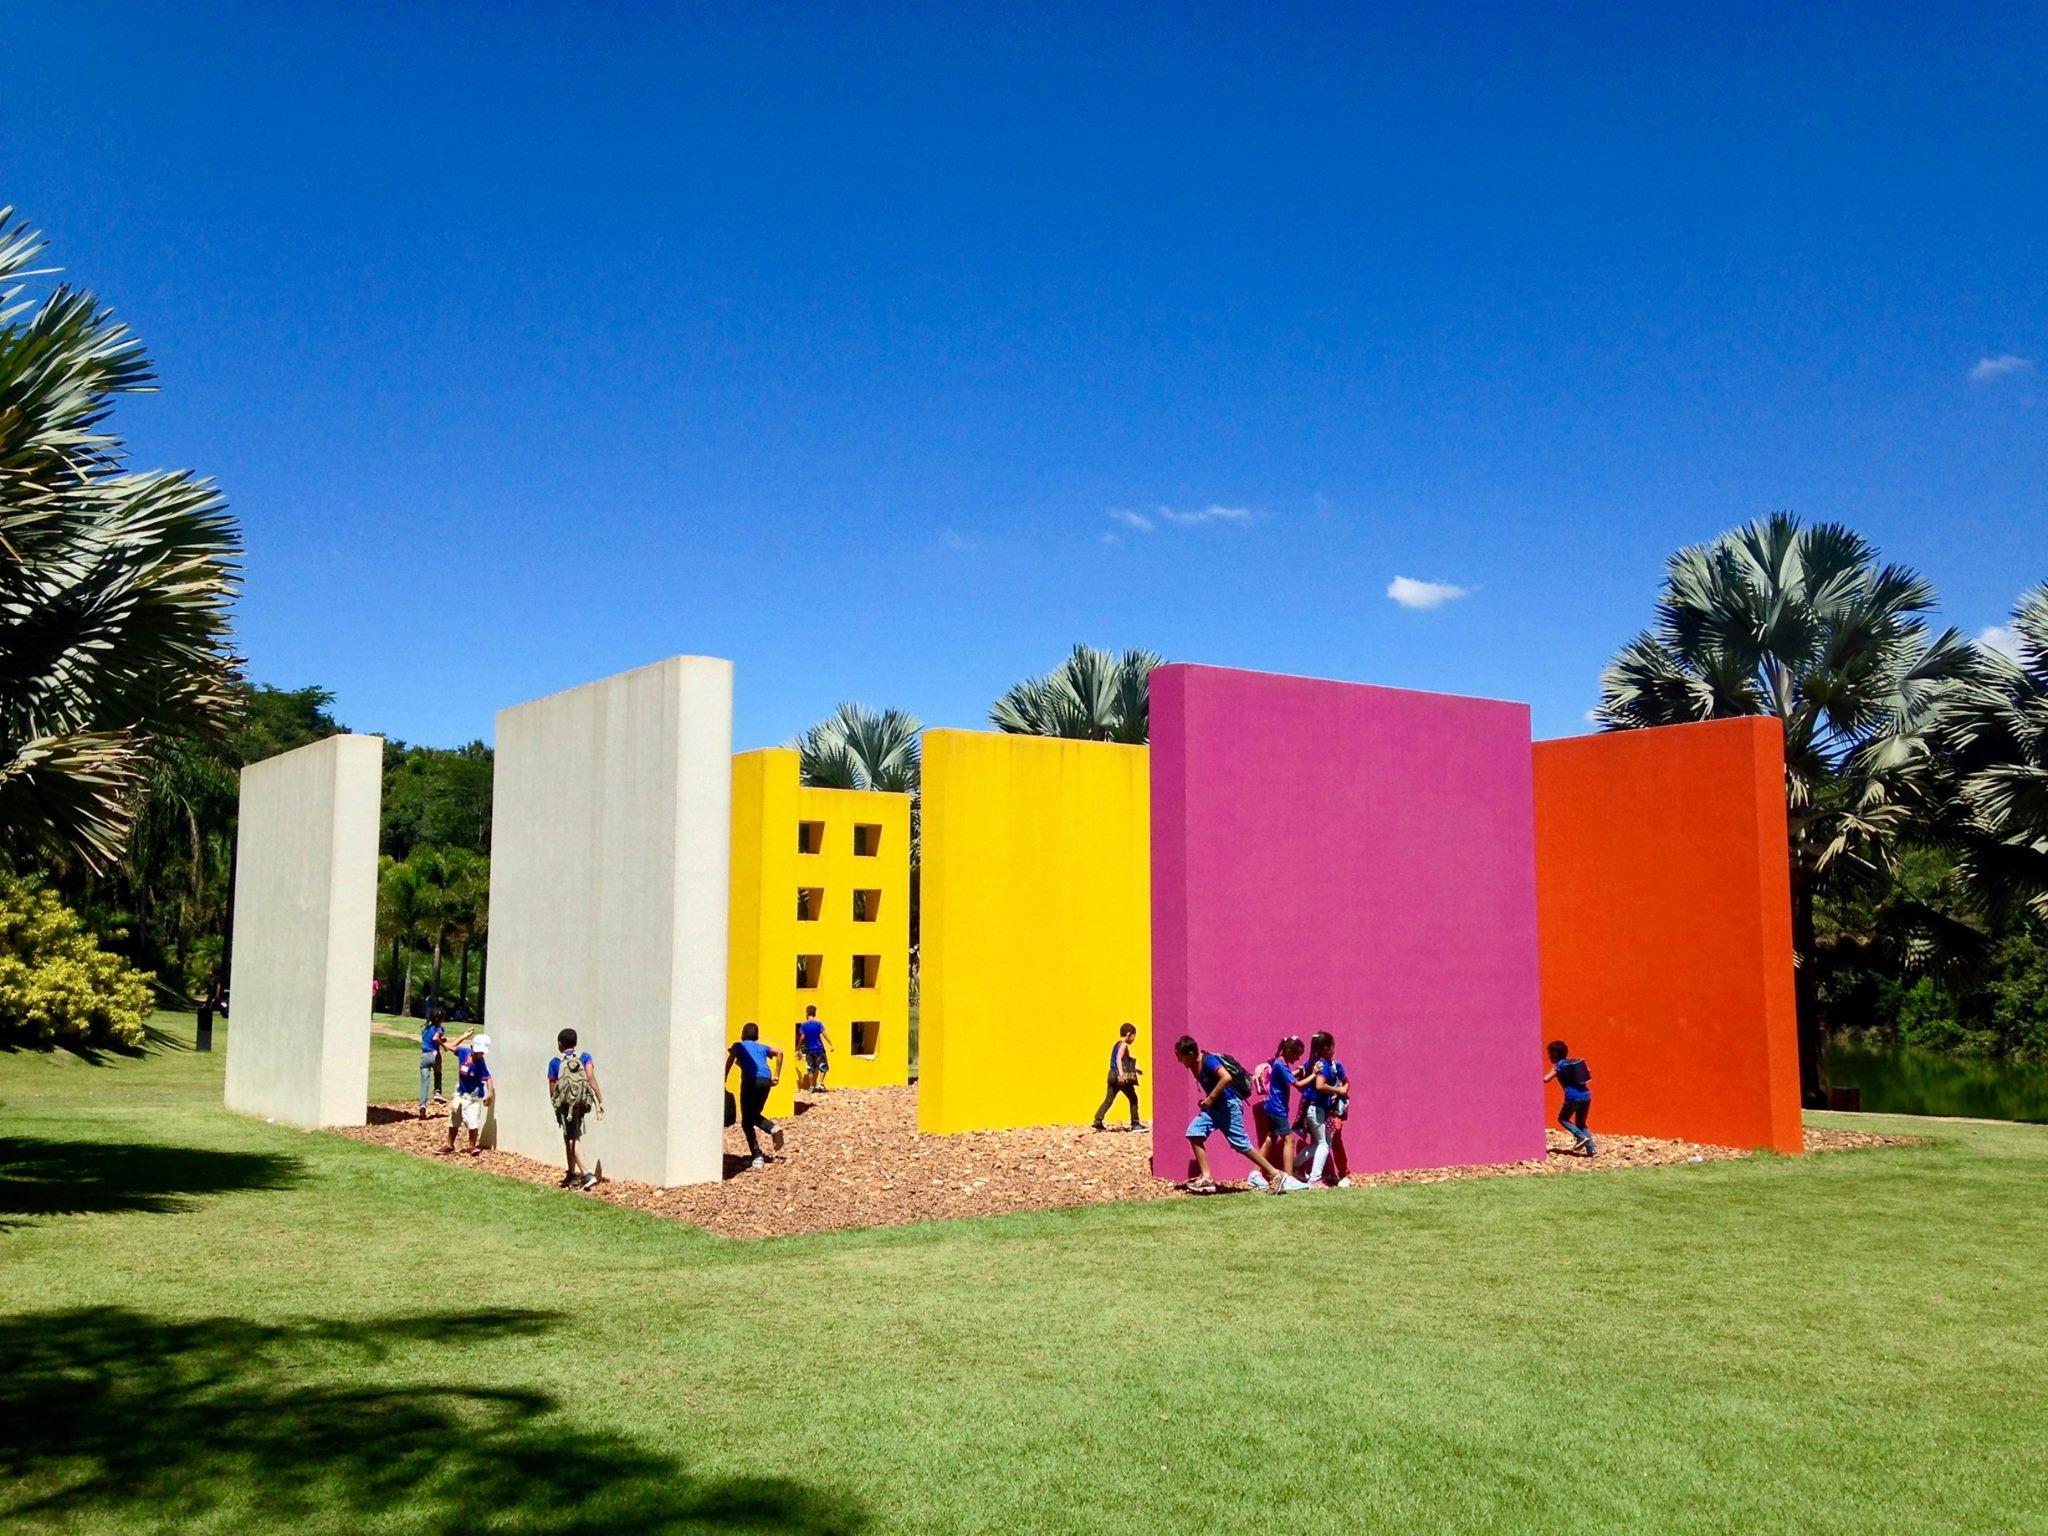 Inhotim Park, Brazil